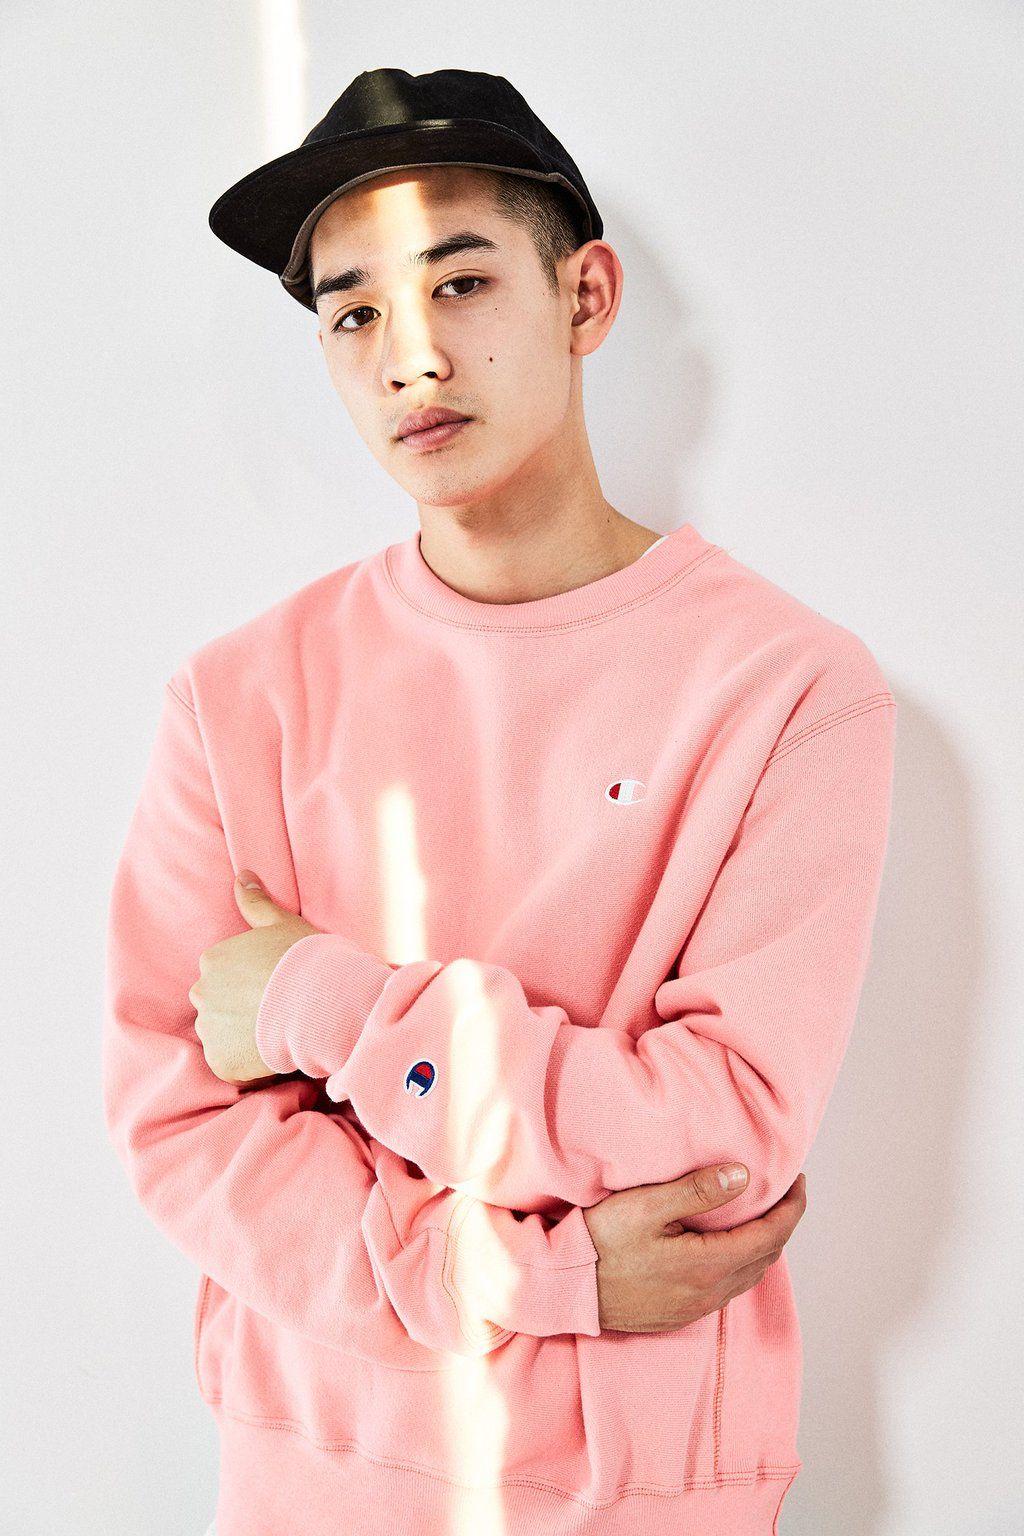 Pin By Josine Castelein On Menswear Champion Clothing Pink Champion Sweatshirt Urban Fashion [ 1536 x 1024 Pixel ]